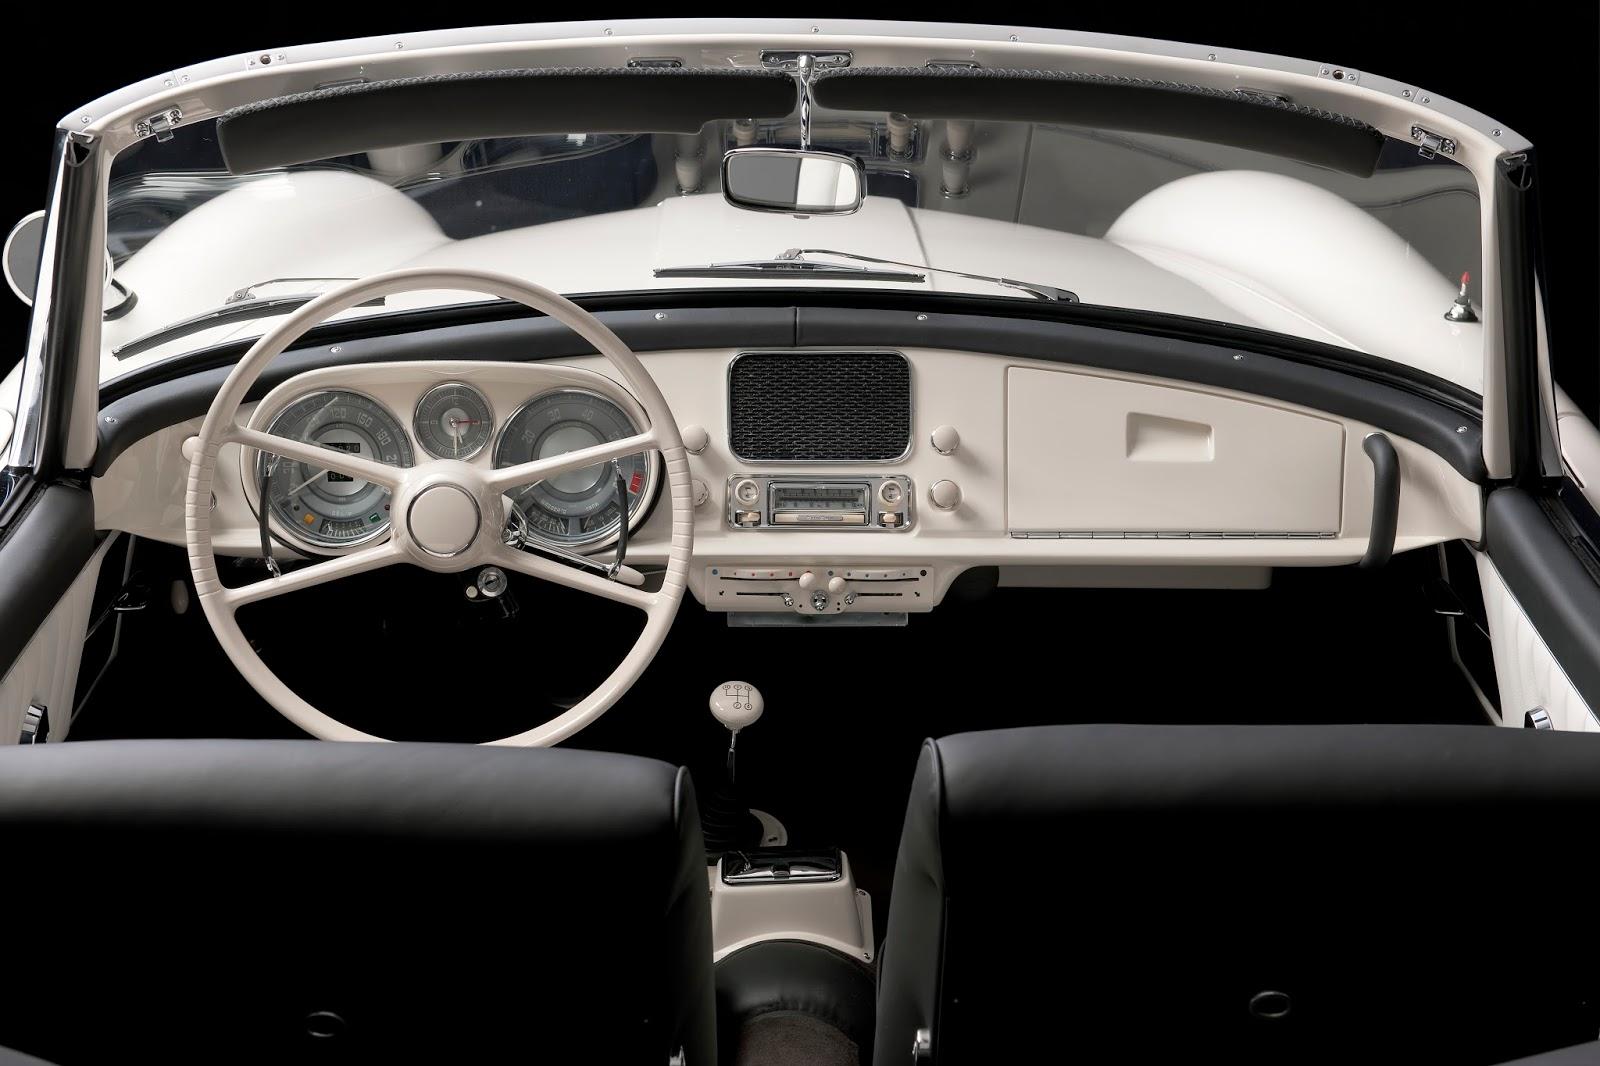 P90229729 highRes elvis bmw 507 08 201 Η επιστροφή της μυθικής BMW 507 του Elvis στο Concours d'Elegance, Pebble Beach autoshow, BMW, BMW 507, Classic, Concours d'Elegance, Roadster, zblog